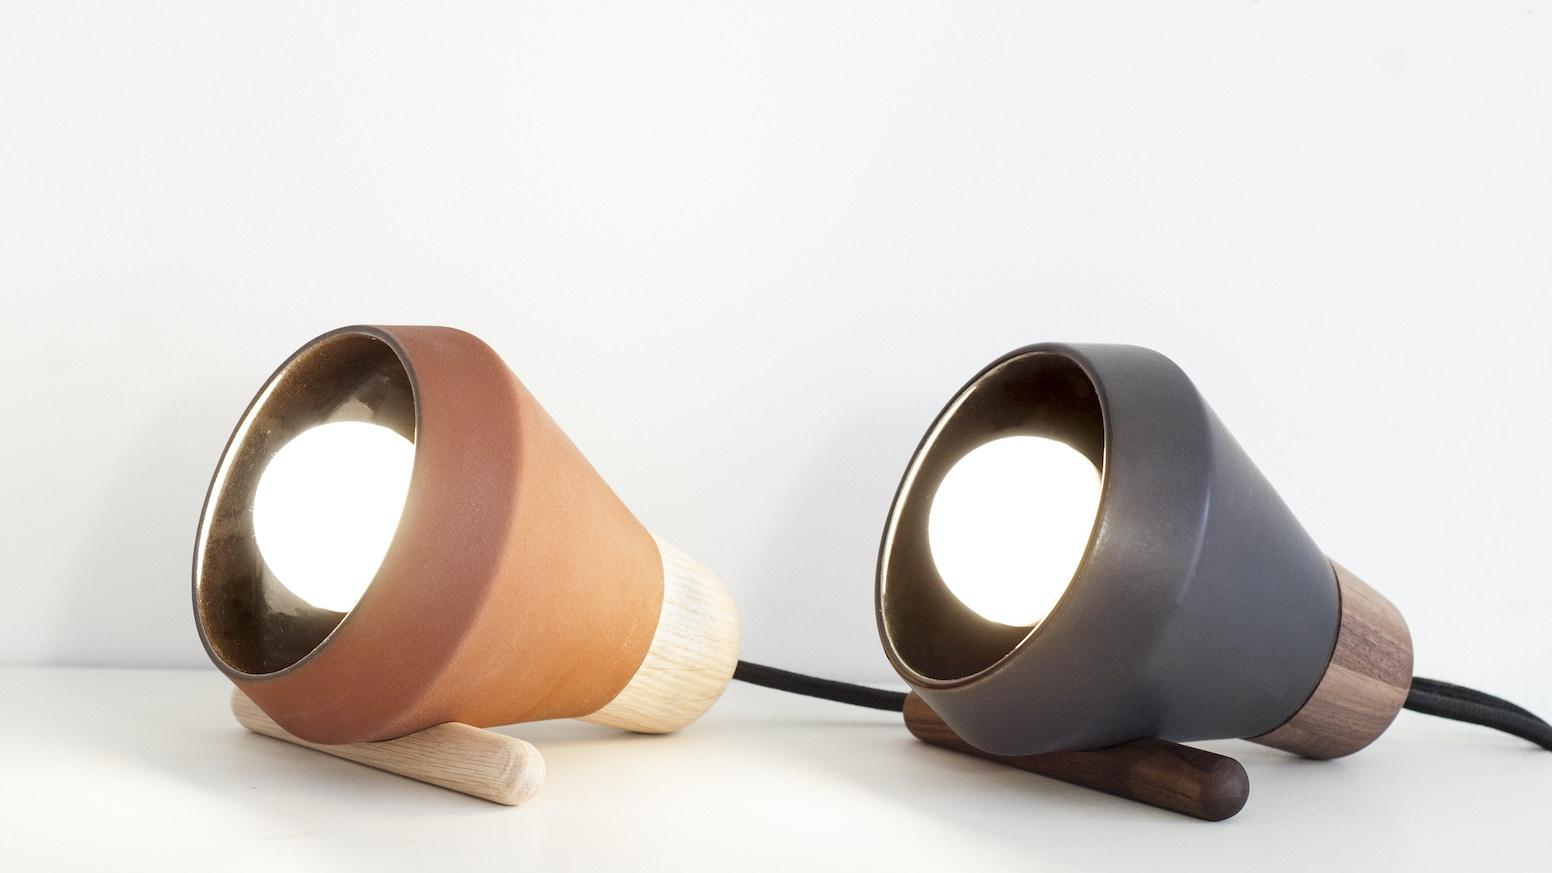 Special edition table lamp for Mexico Creates in collaboration with Galeria Mexicana de Diseño. / Lampara de mesa edición especial